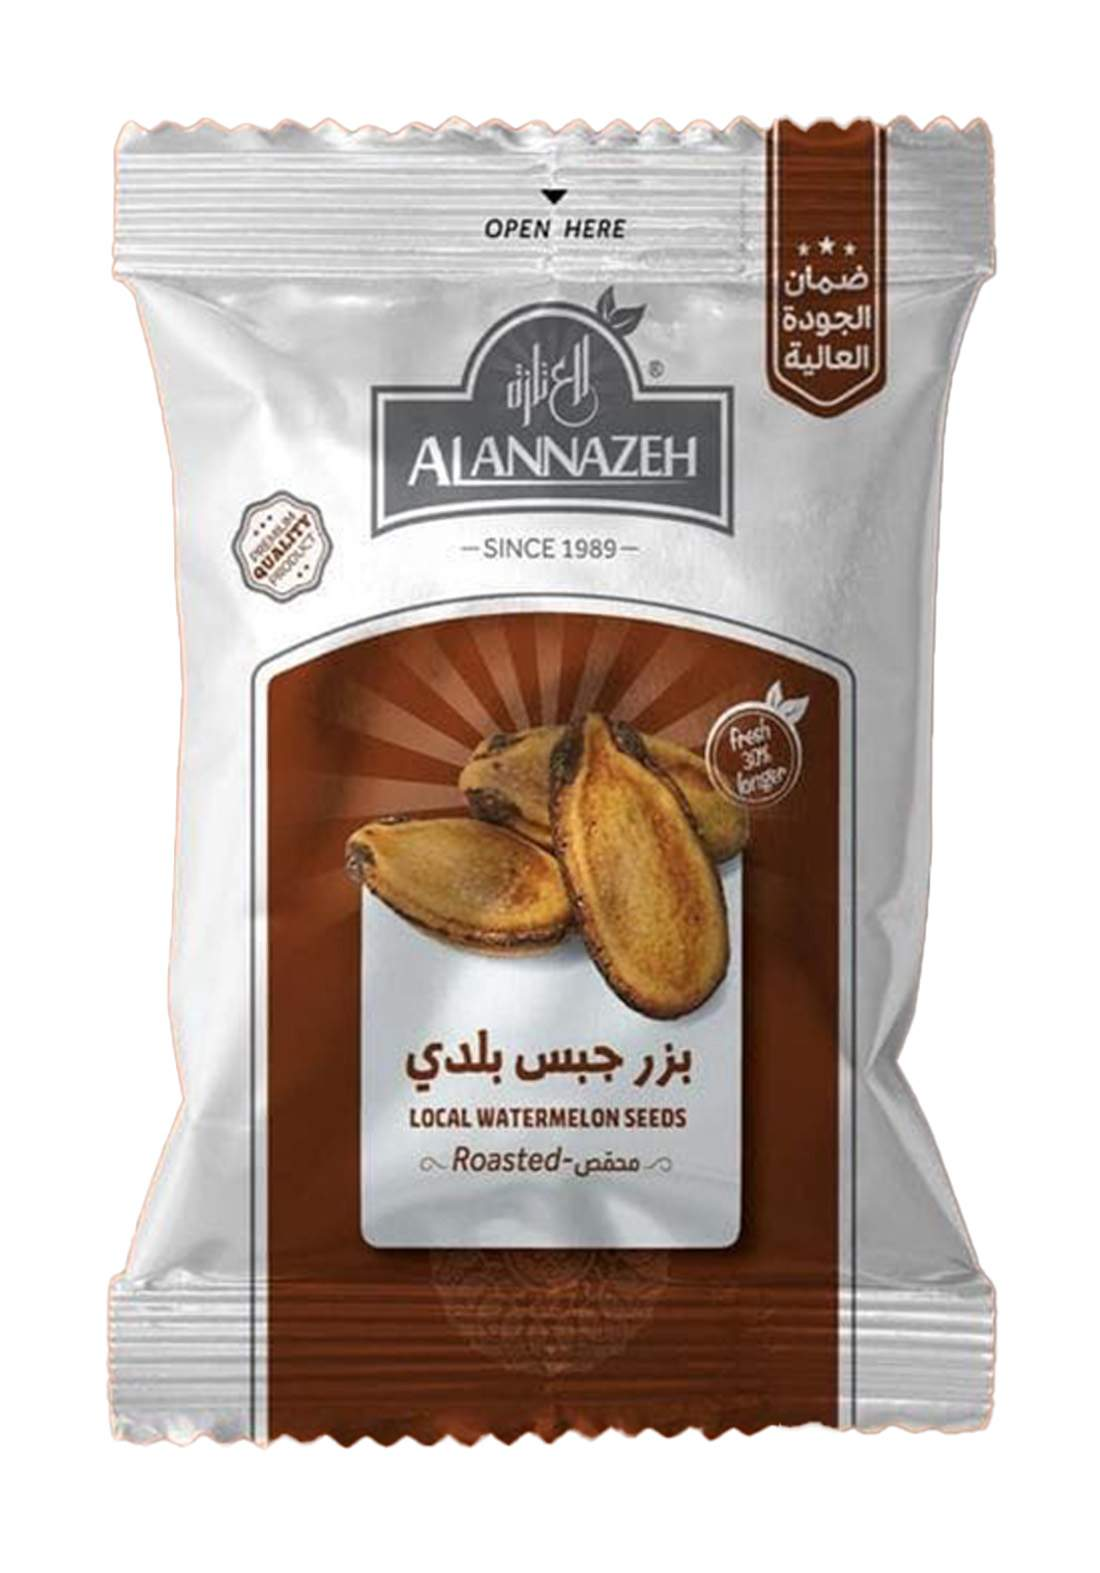 Al-Annazeh Baladi Gypsum Seeds Nuts 90g بزر جبس بلدي